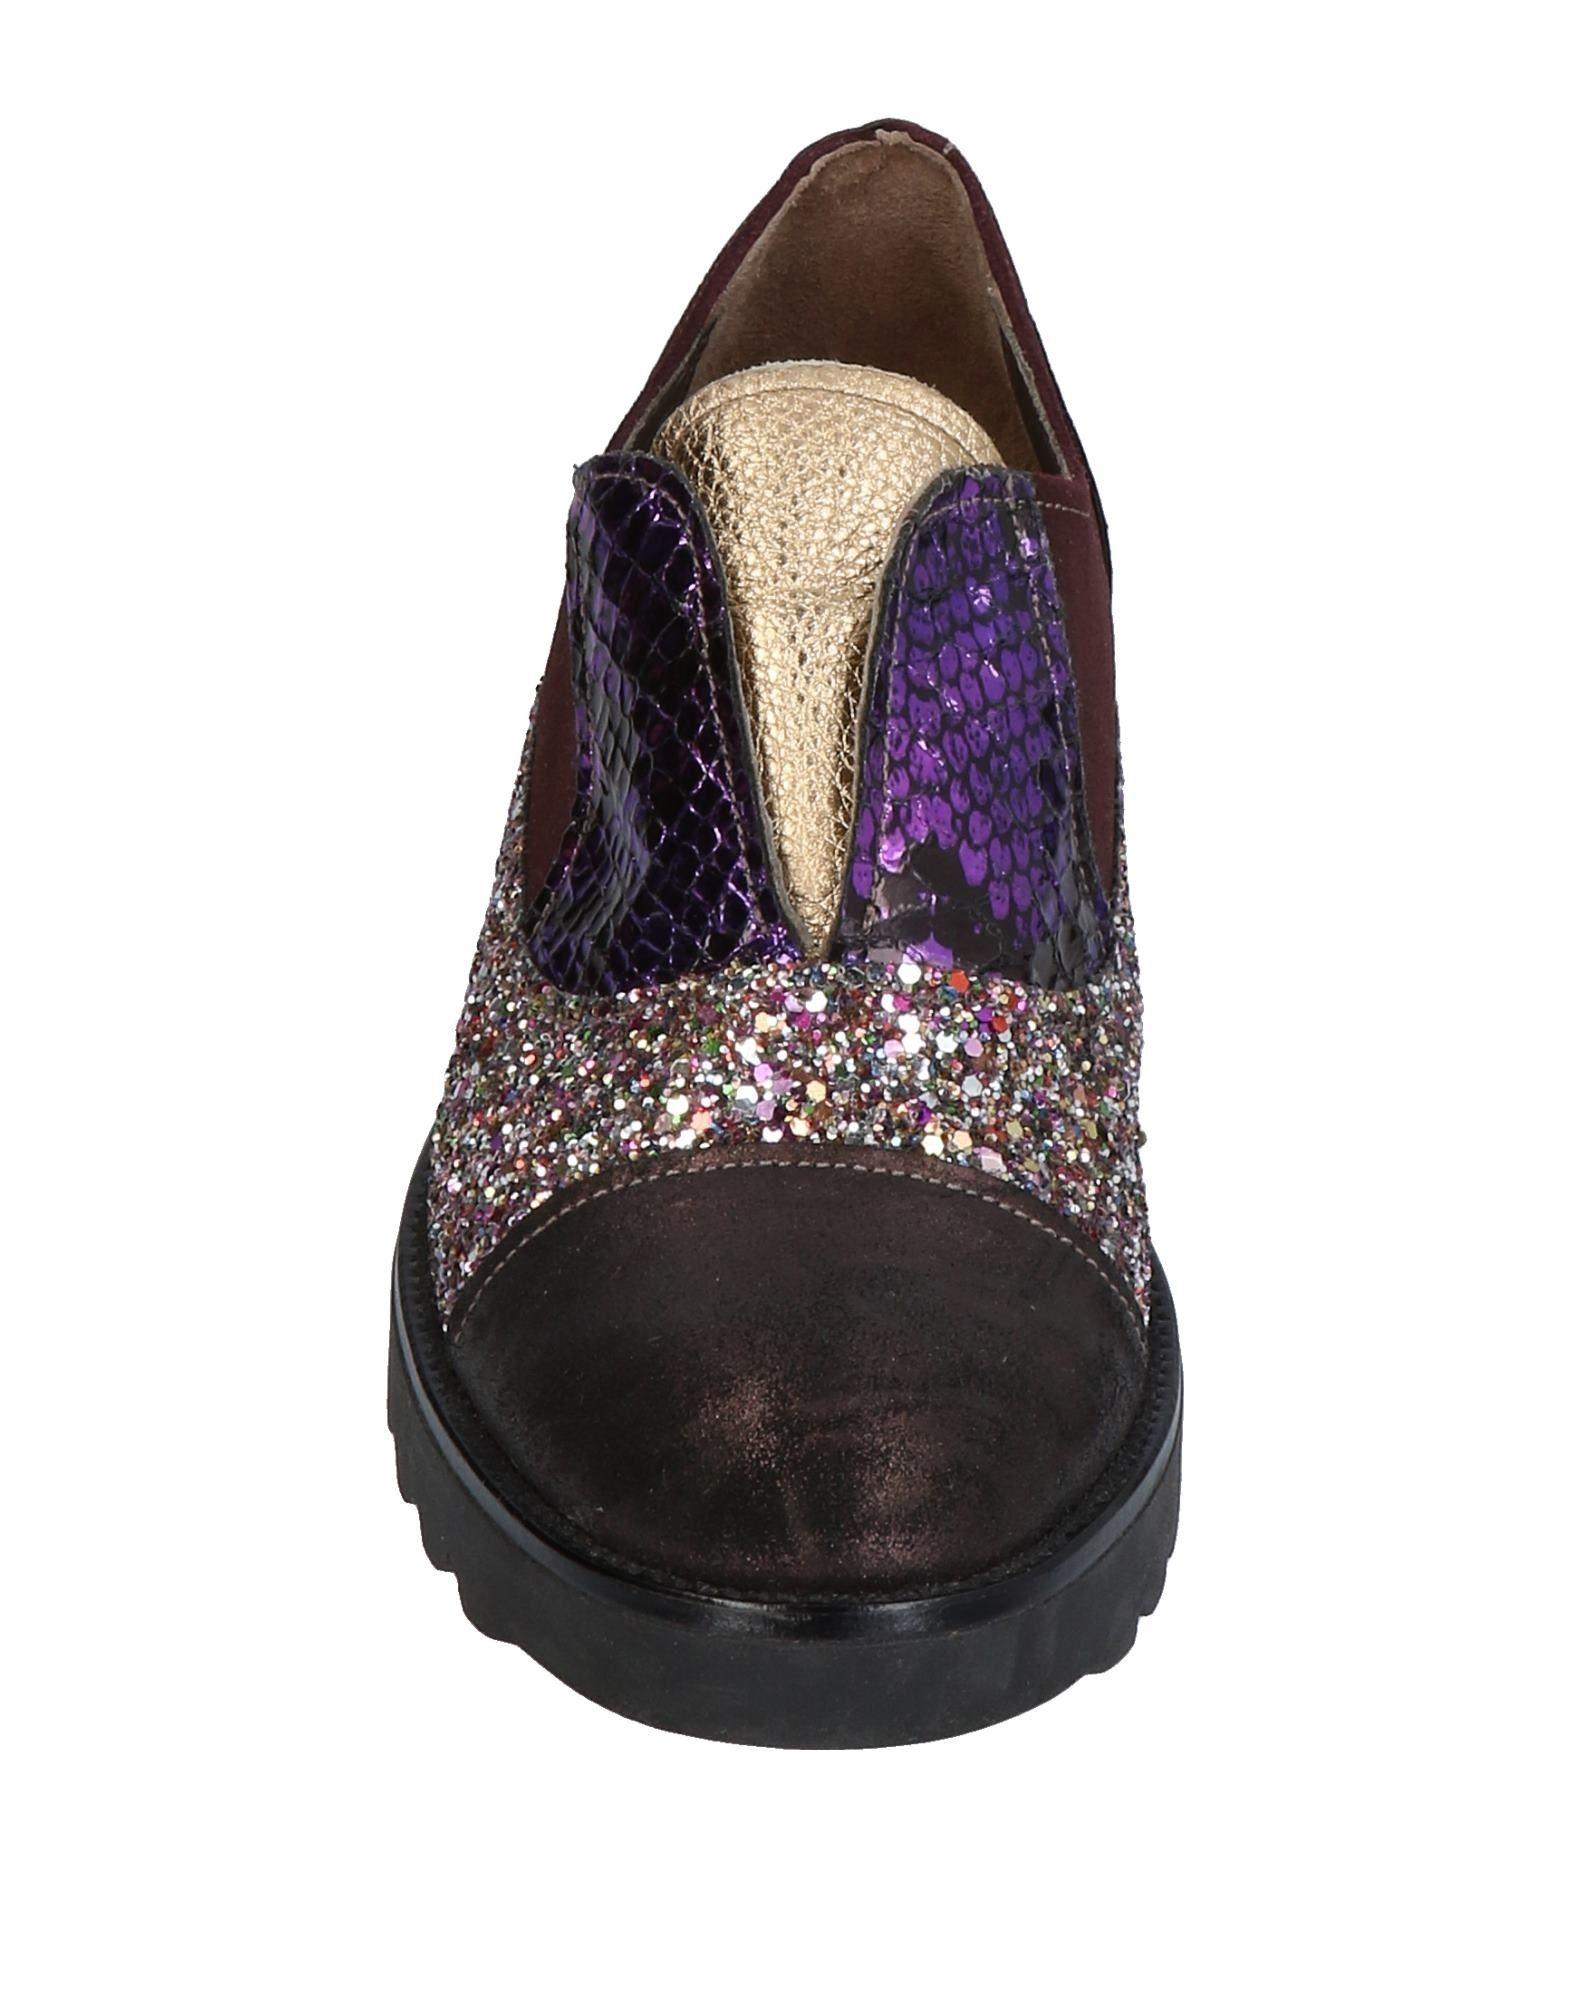 Ebarrito Mokassins Damen  11457369HG Gute Qualität beliebte Schuhe Schuhe beliebte aed4dd